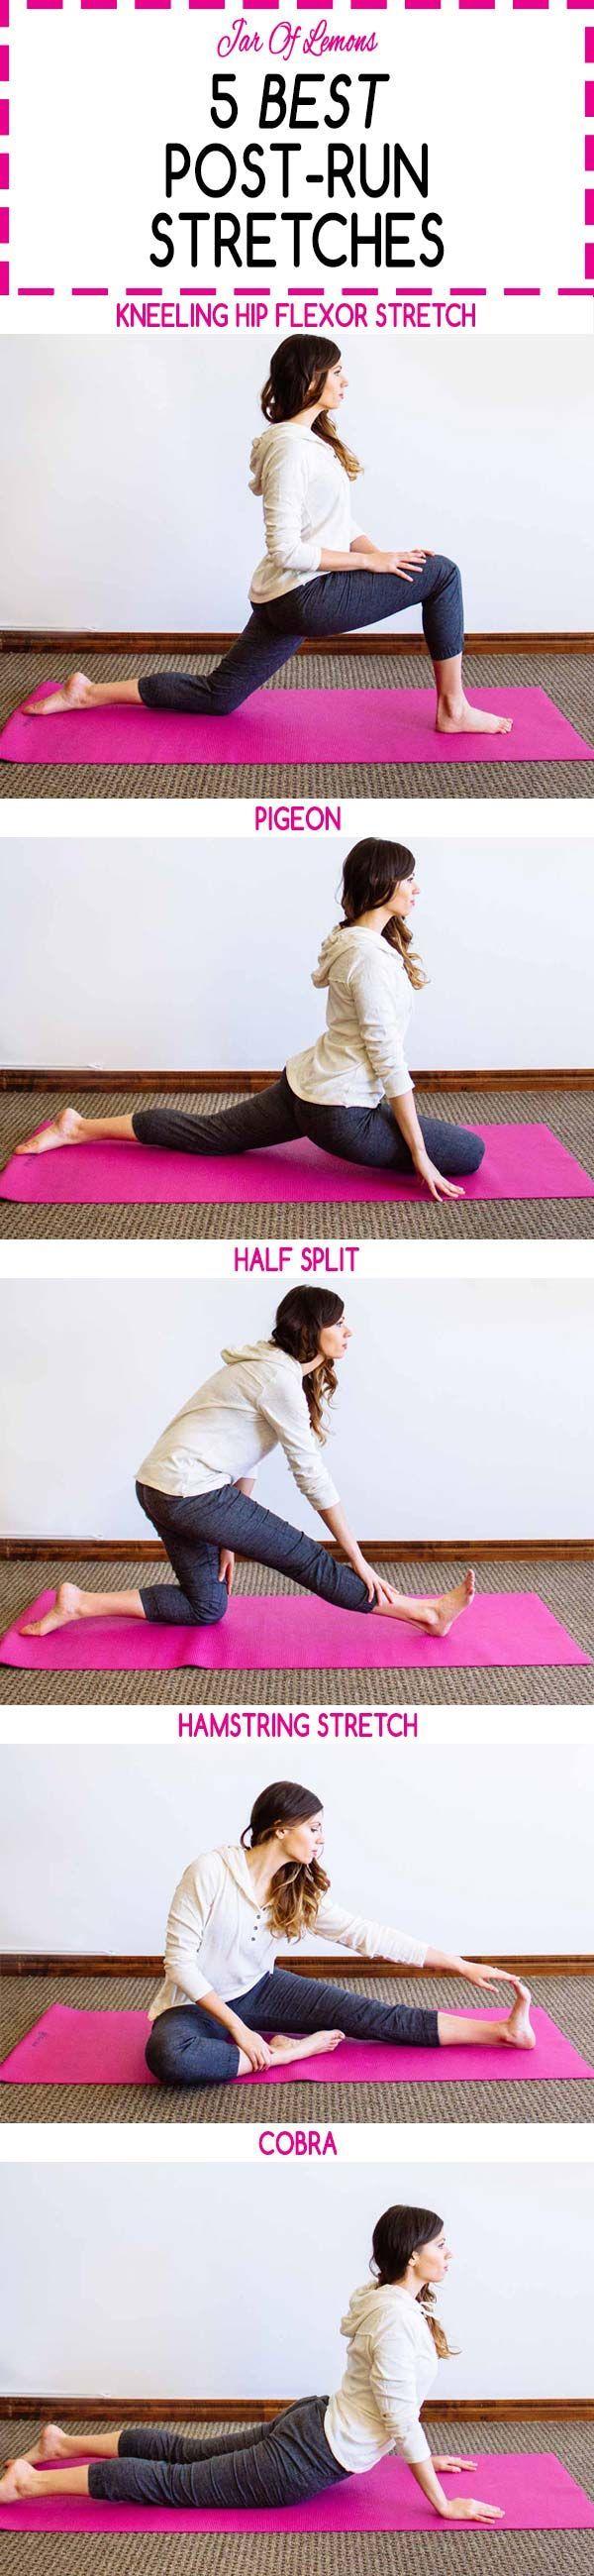 5 Best Postrun Stretches